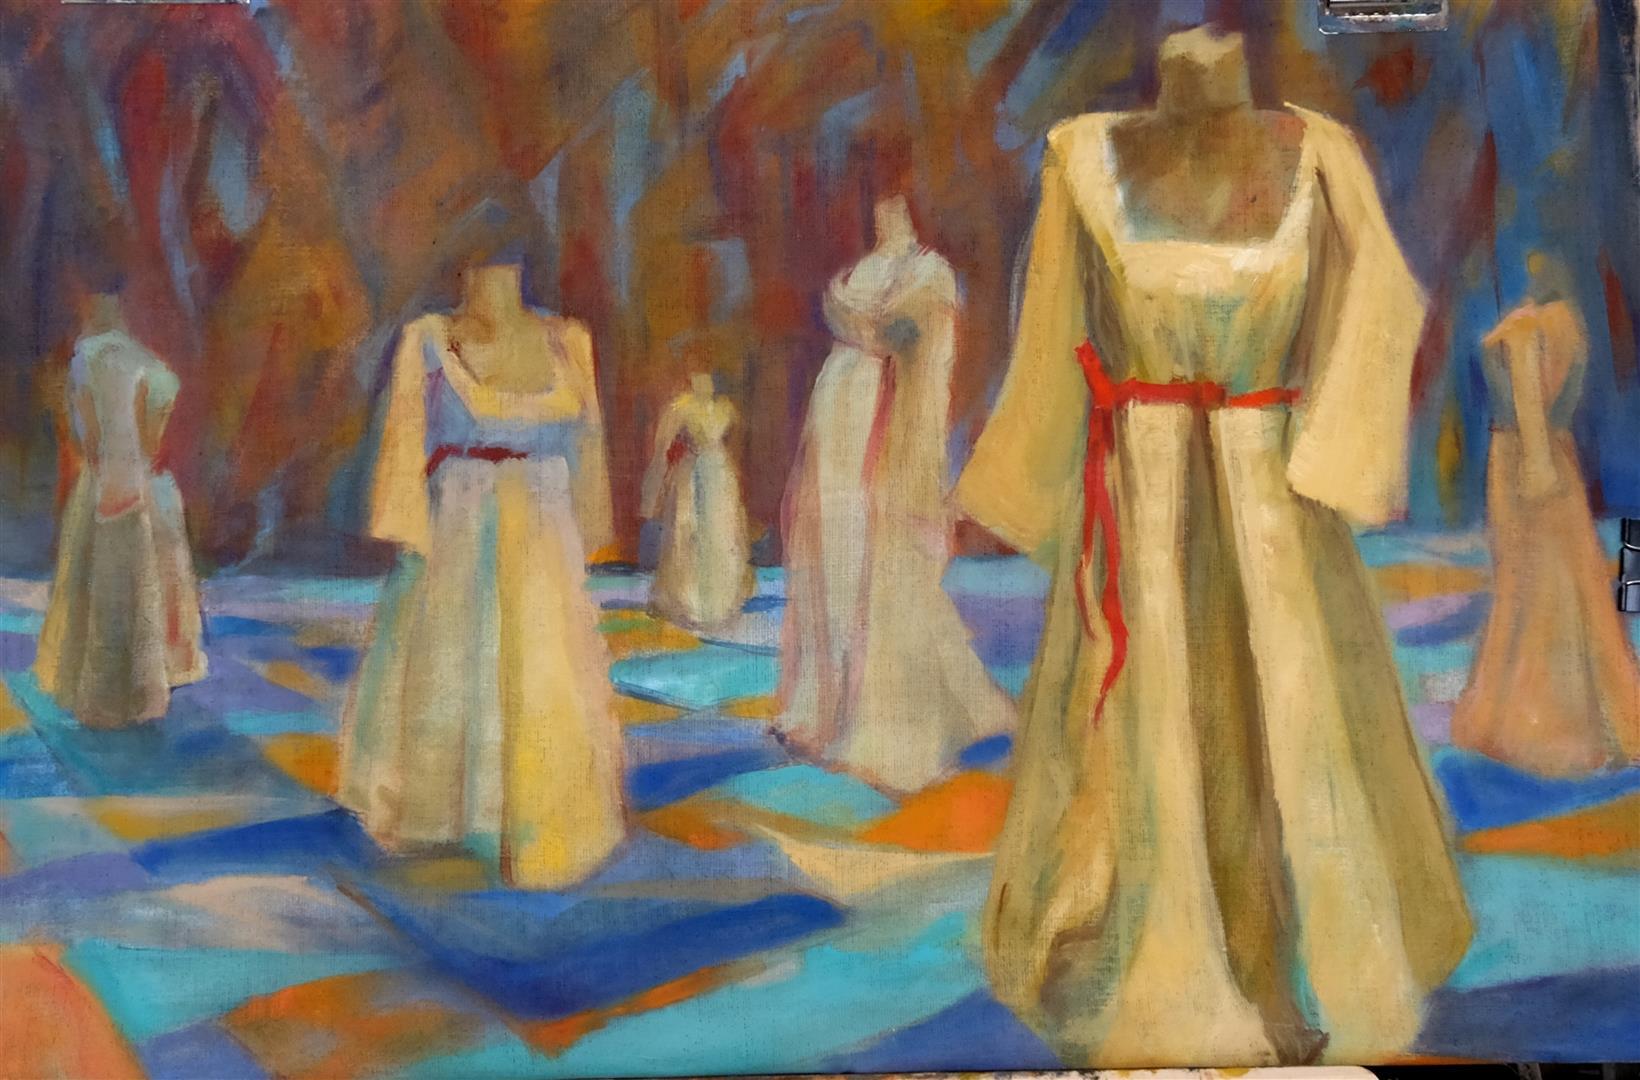 Robes au présentoir